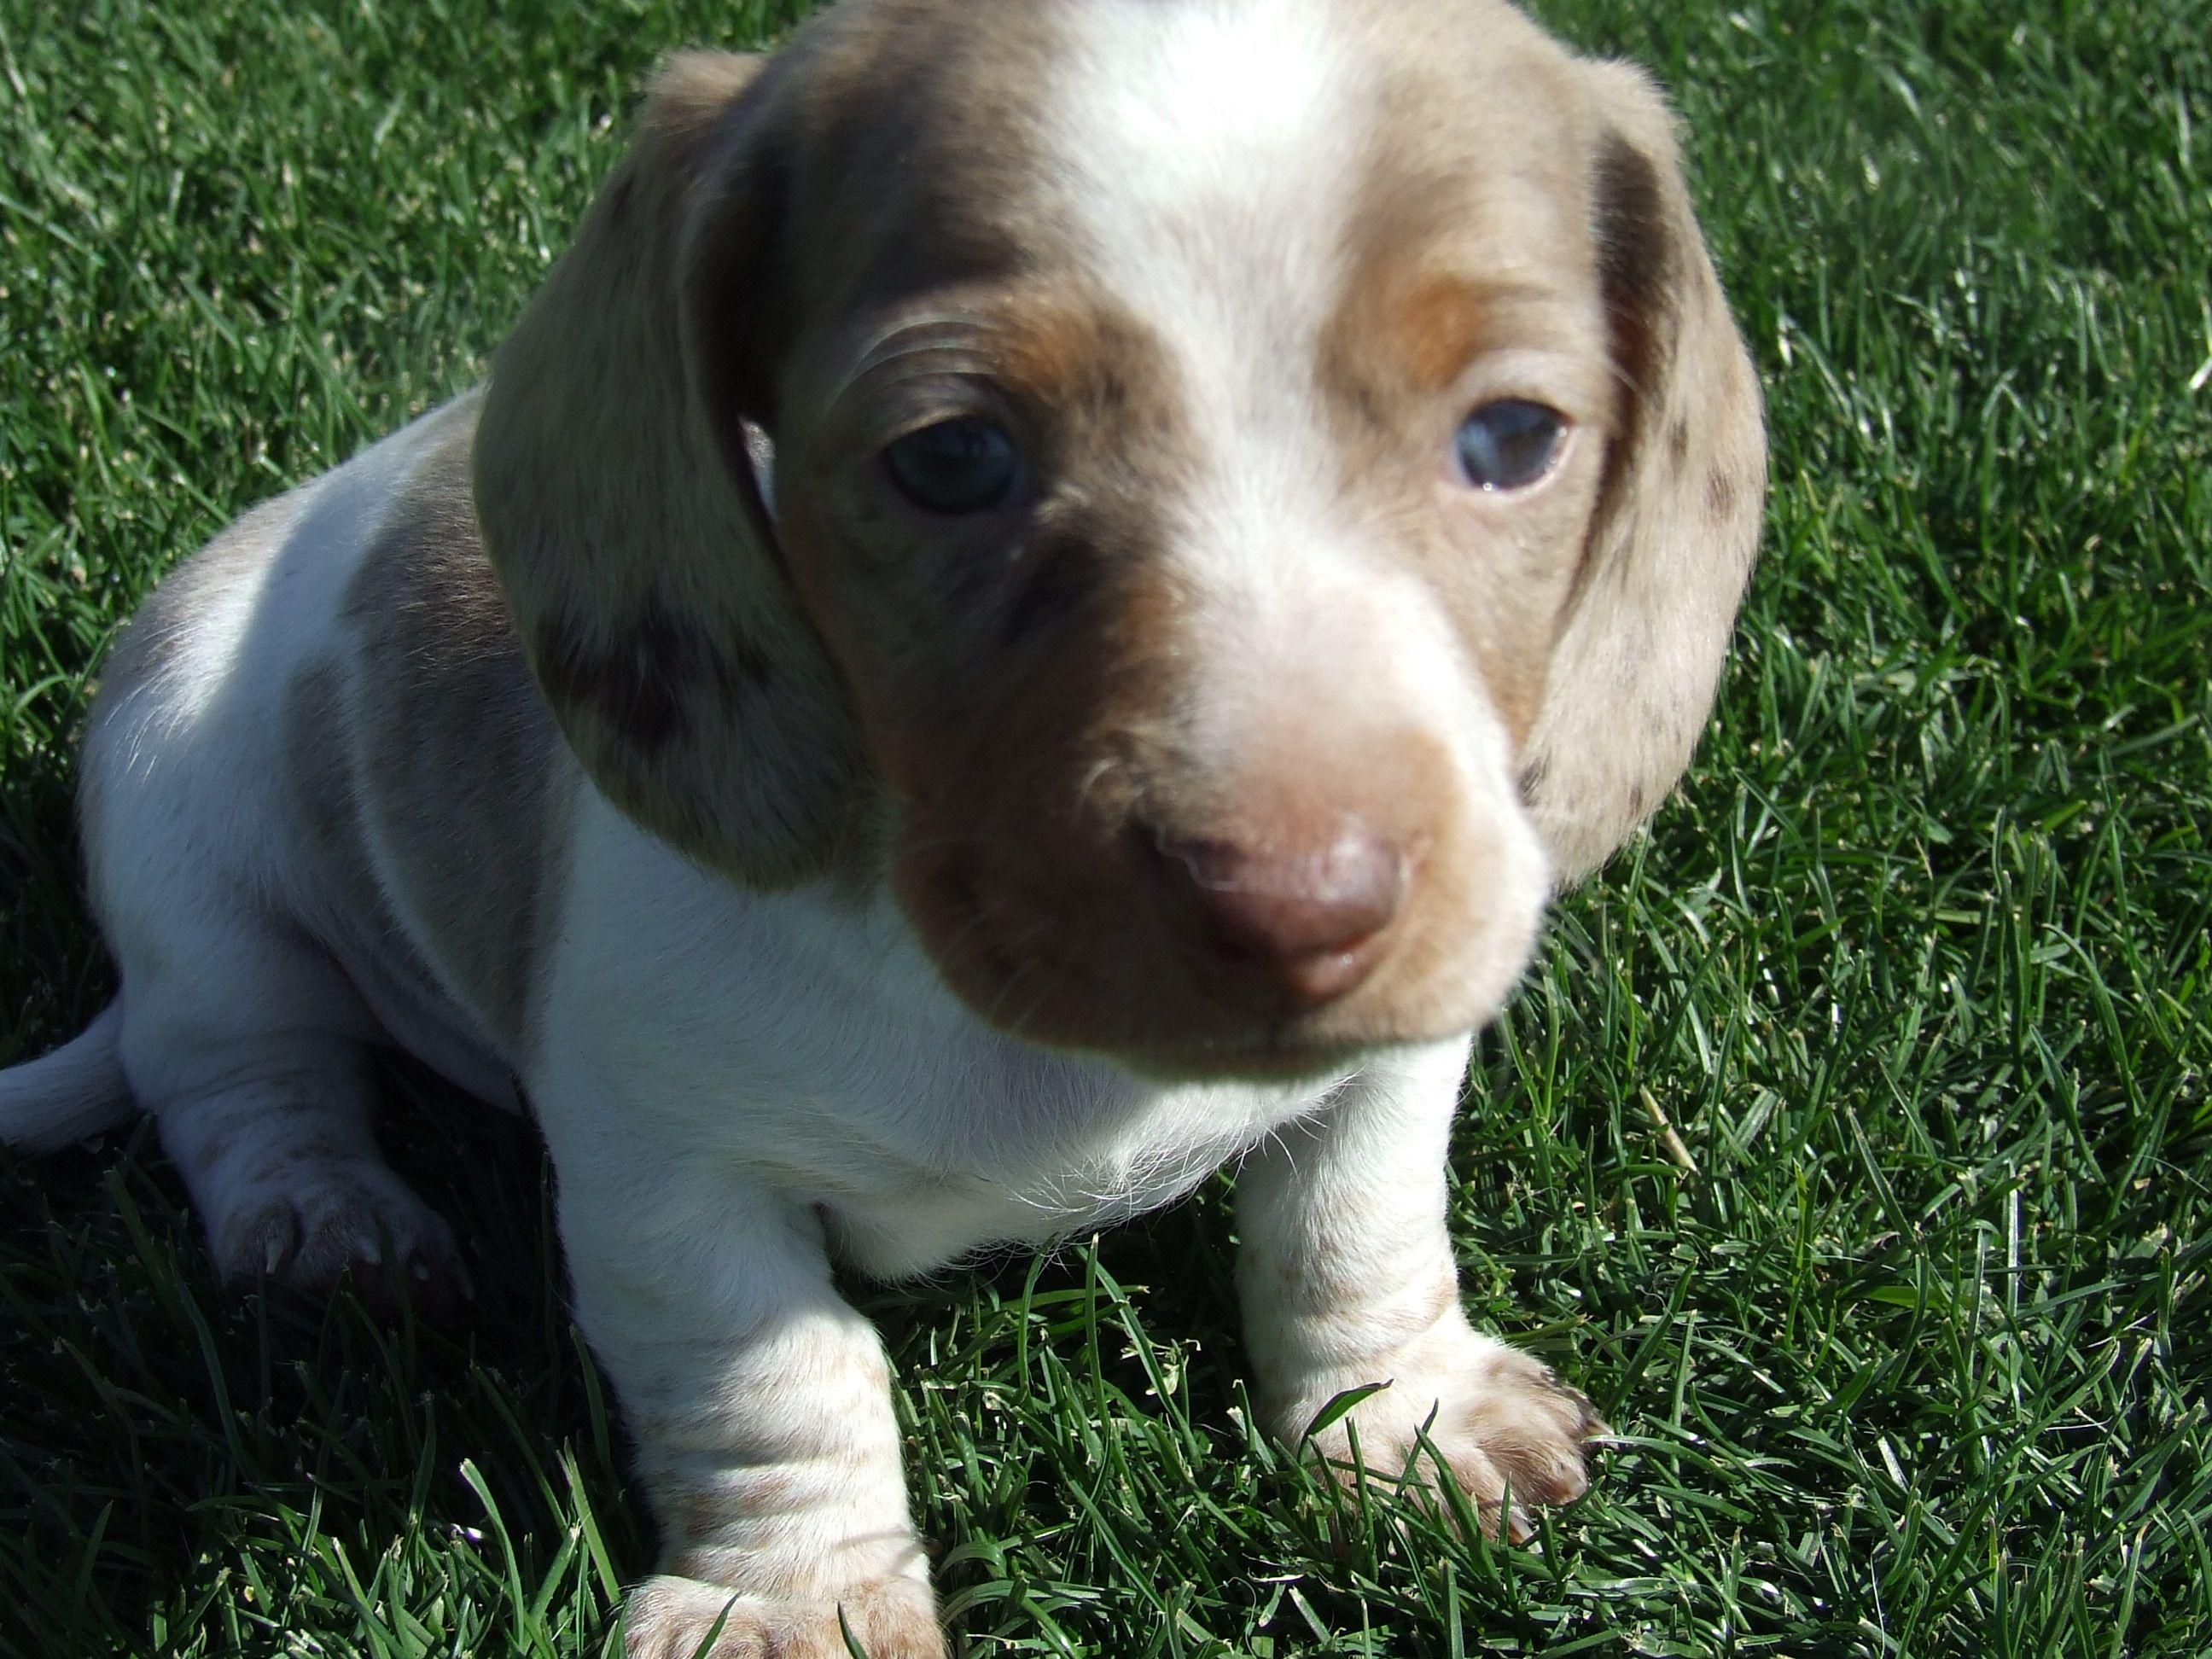 Isabella Dapple Piebald Baby With Beautiful Blue Eyes From Arizona Ground Hounds Sam Dachshund Puppies Cute Animals Sausage Dog